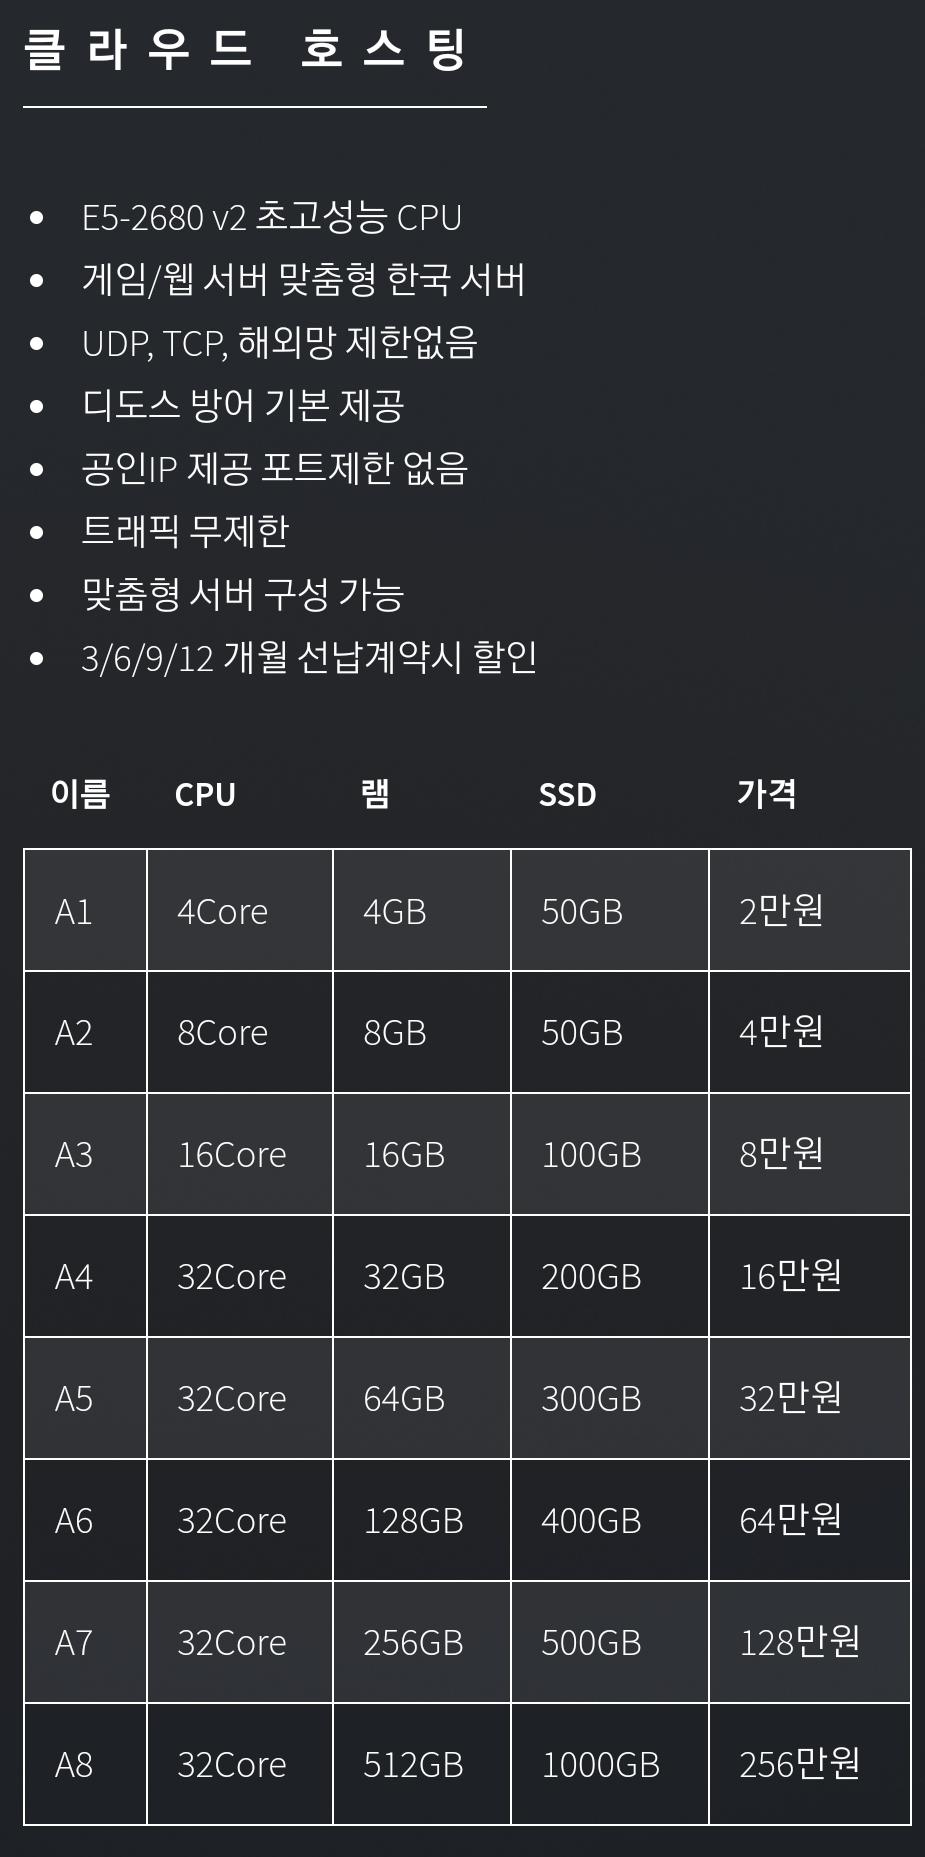 SmartSelect_20201208-050159_Chrome.jpg